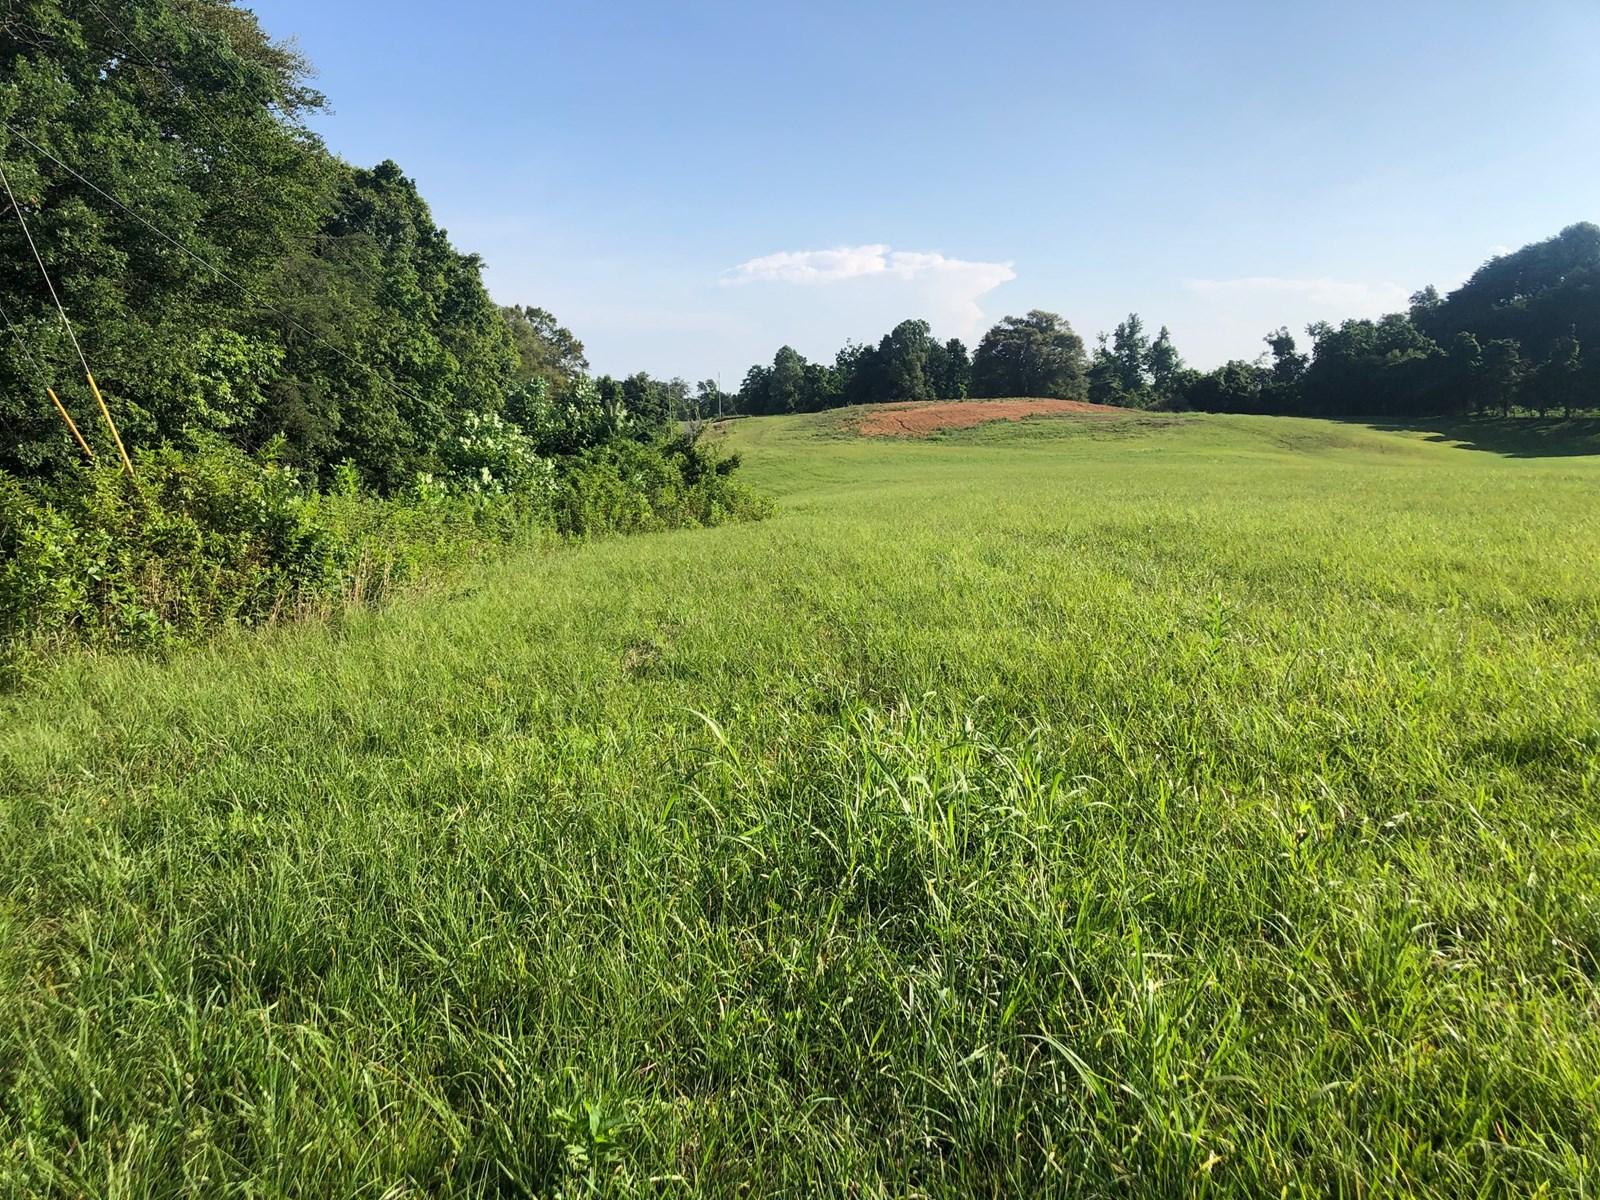 Land for Sale near Lake Cumberland